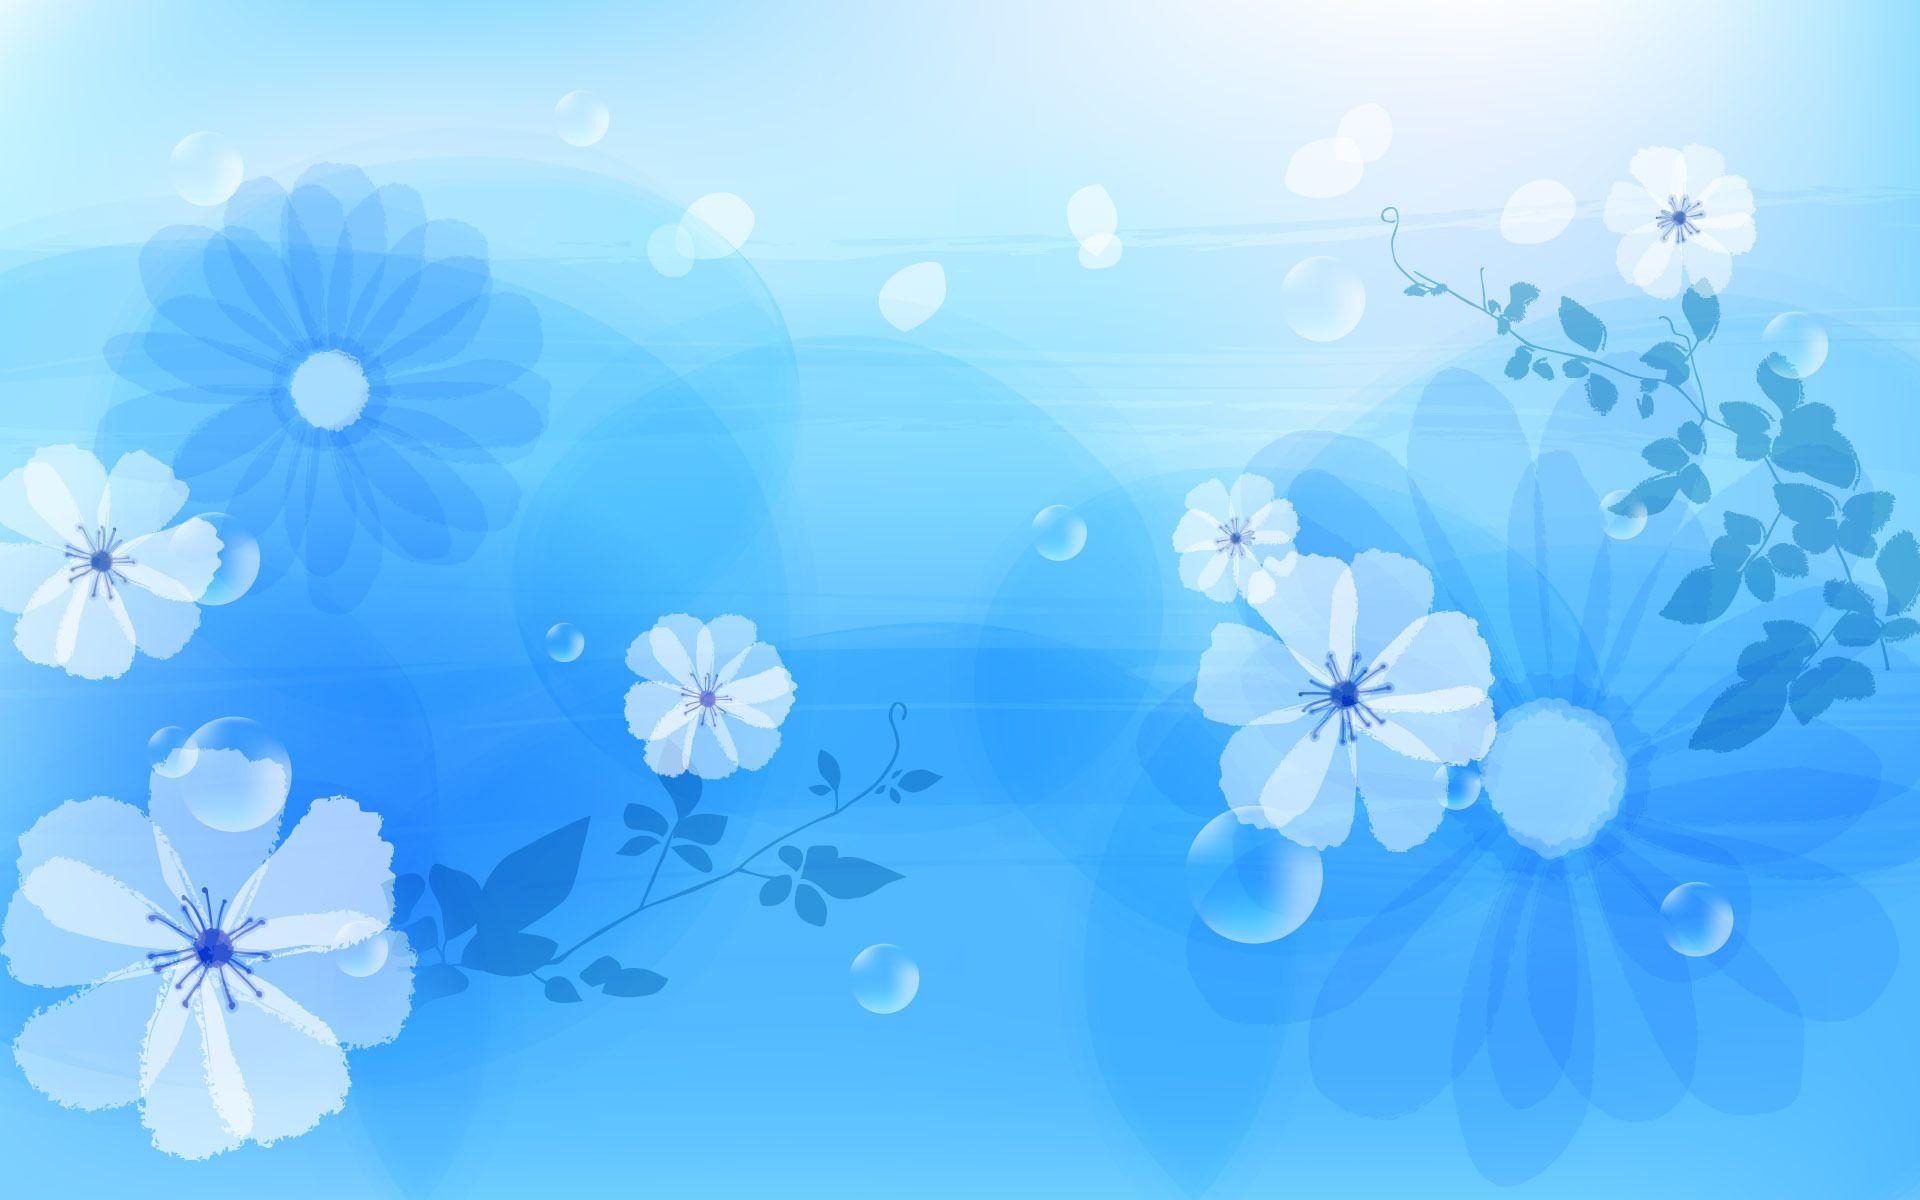 Light Blue Wallpaper For Desktop Blue Flowers Background Blue Flower Wallpaper Flower Background Images